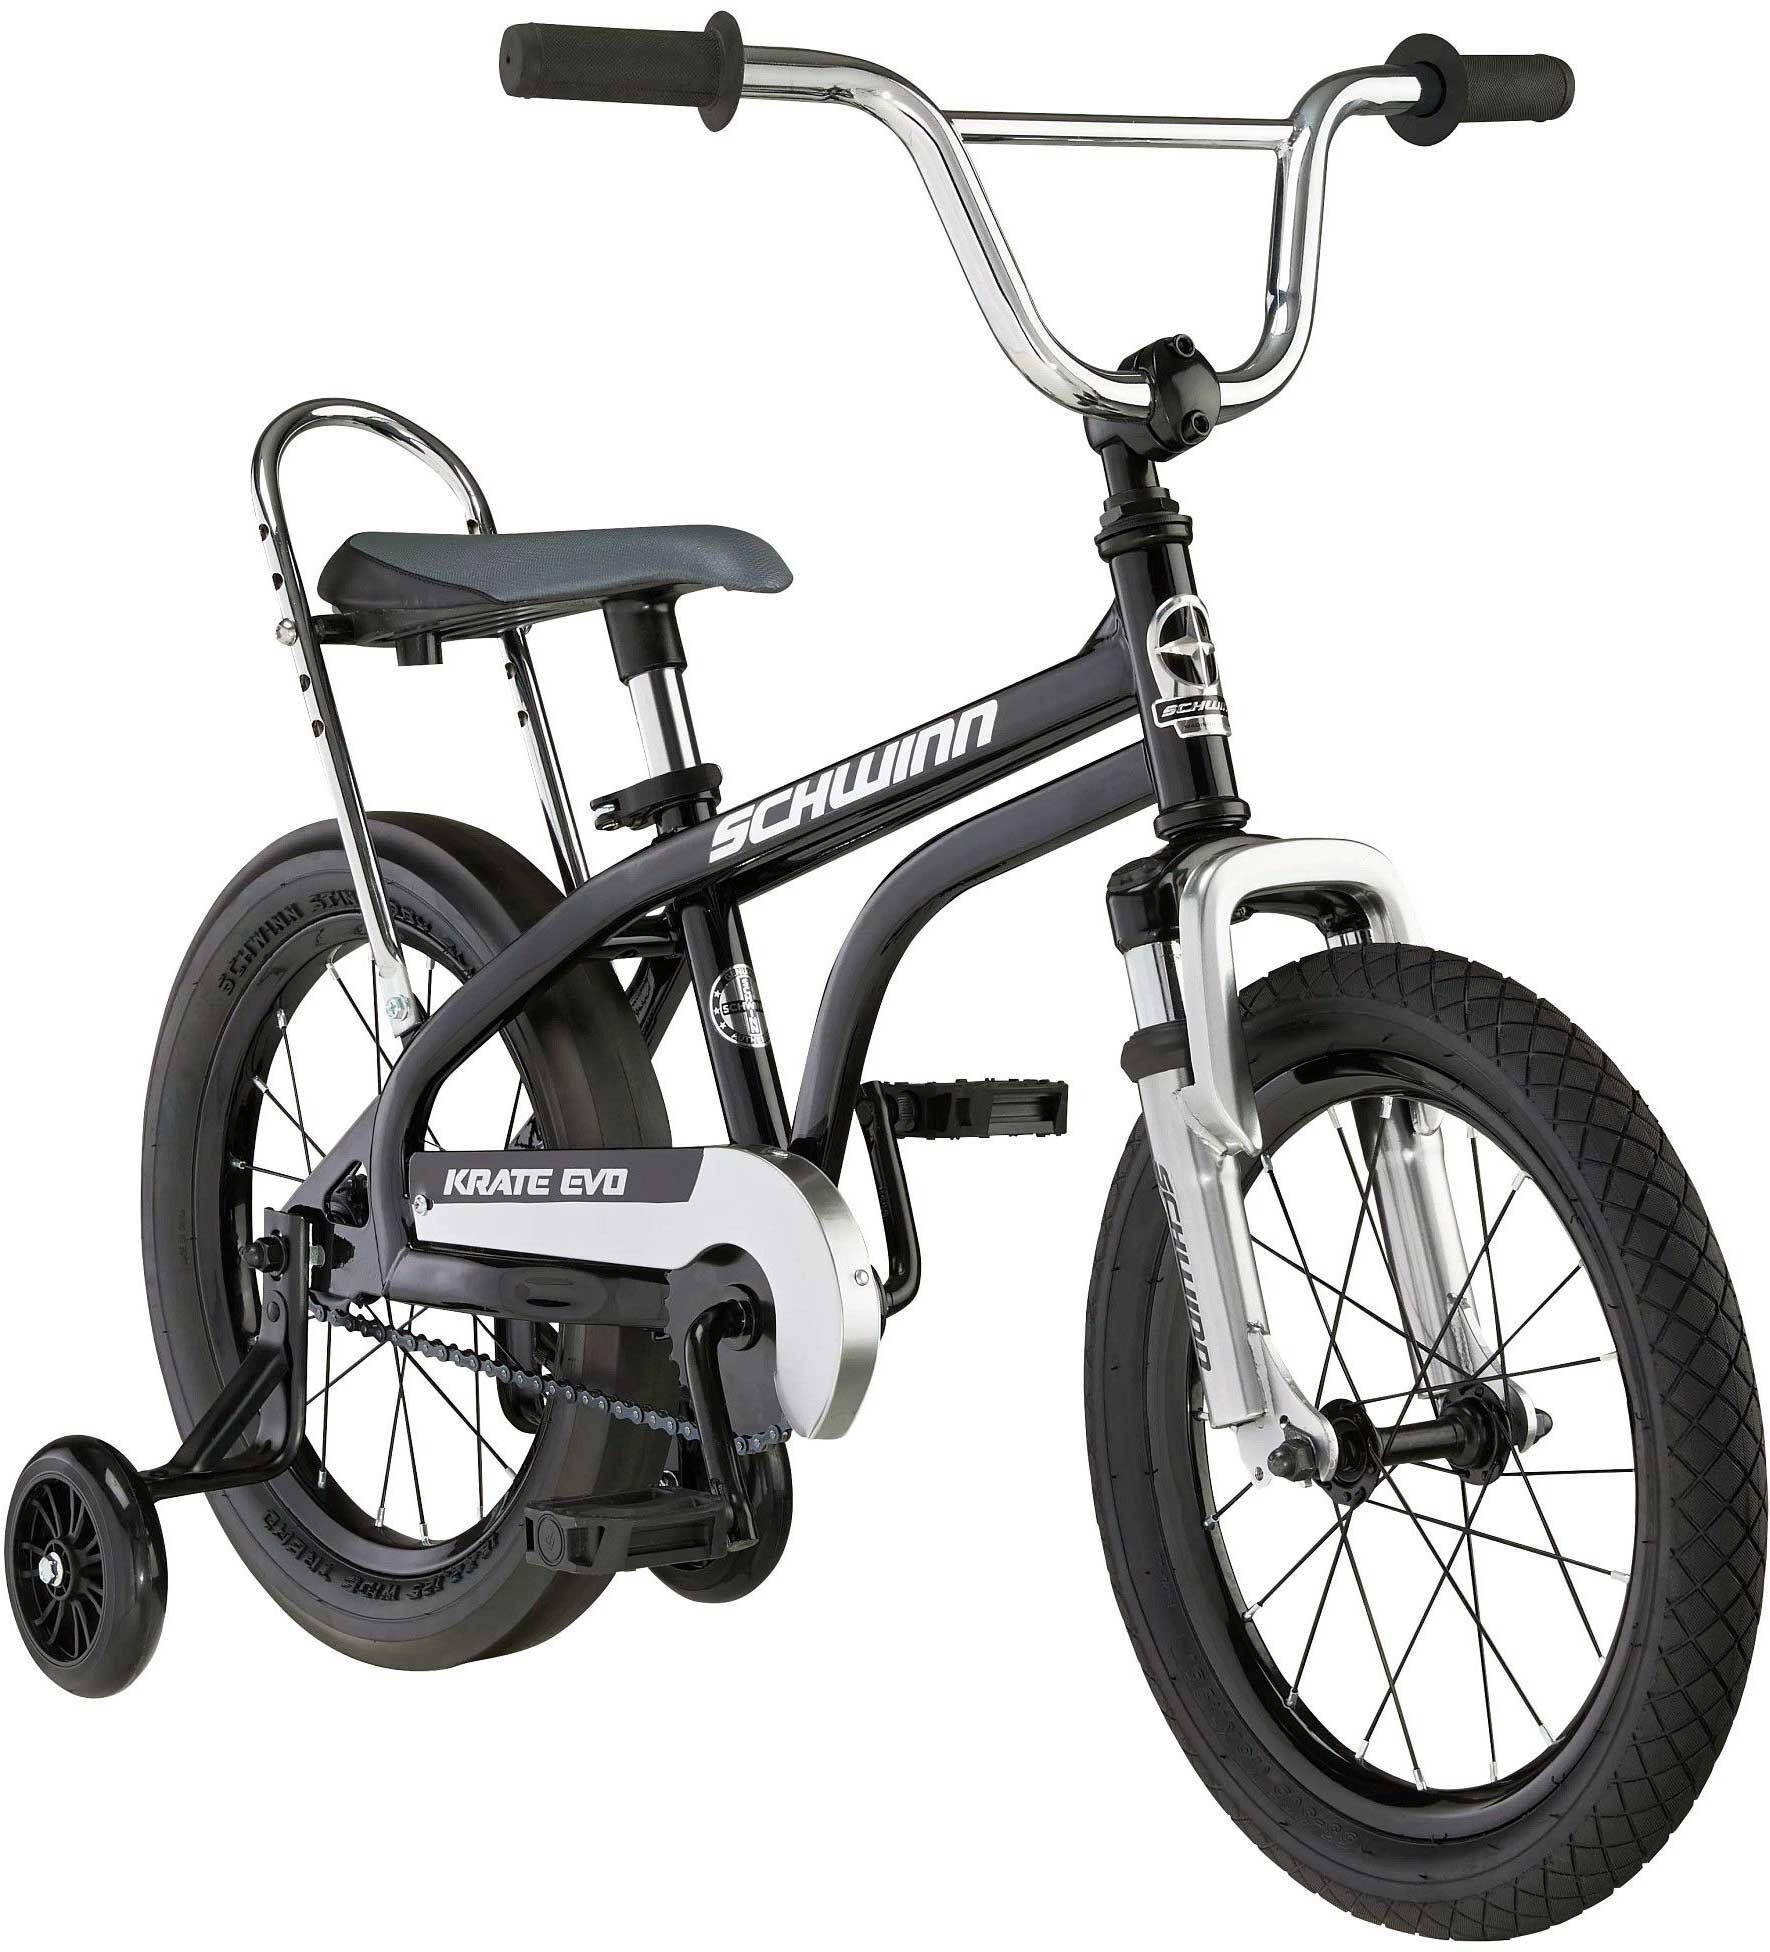 "Schwinn Youth 16"" Krate EVO Bike, 16 IN., Black"